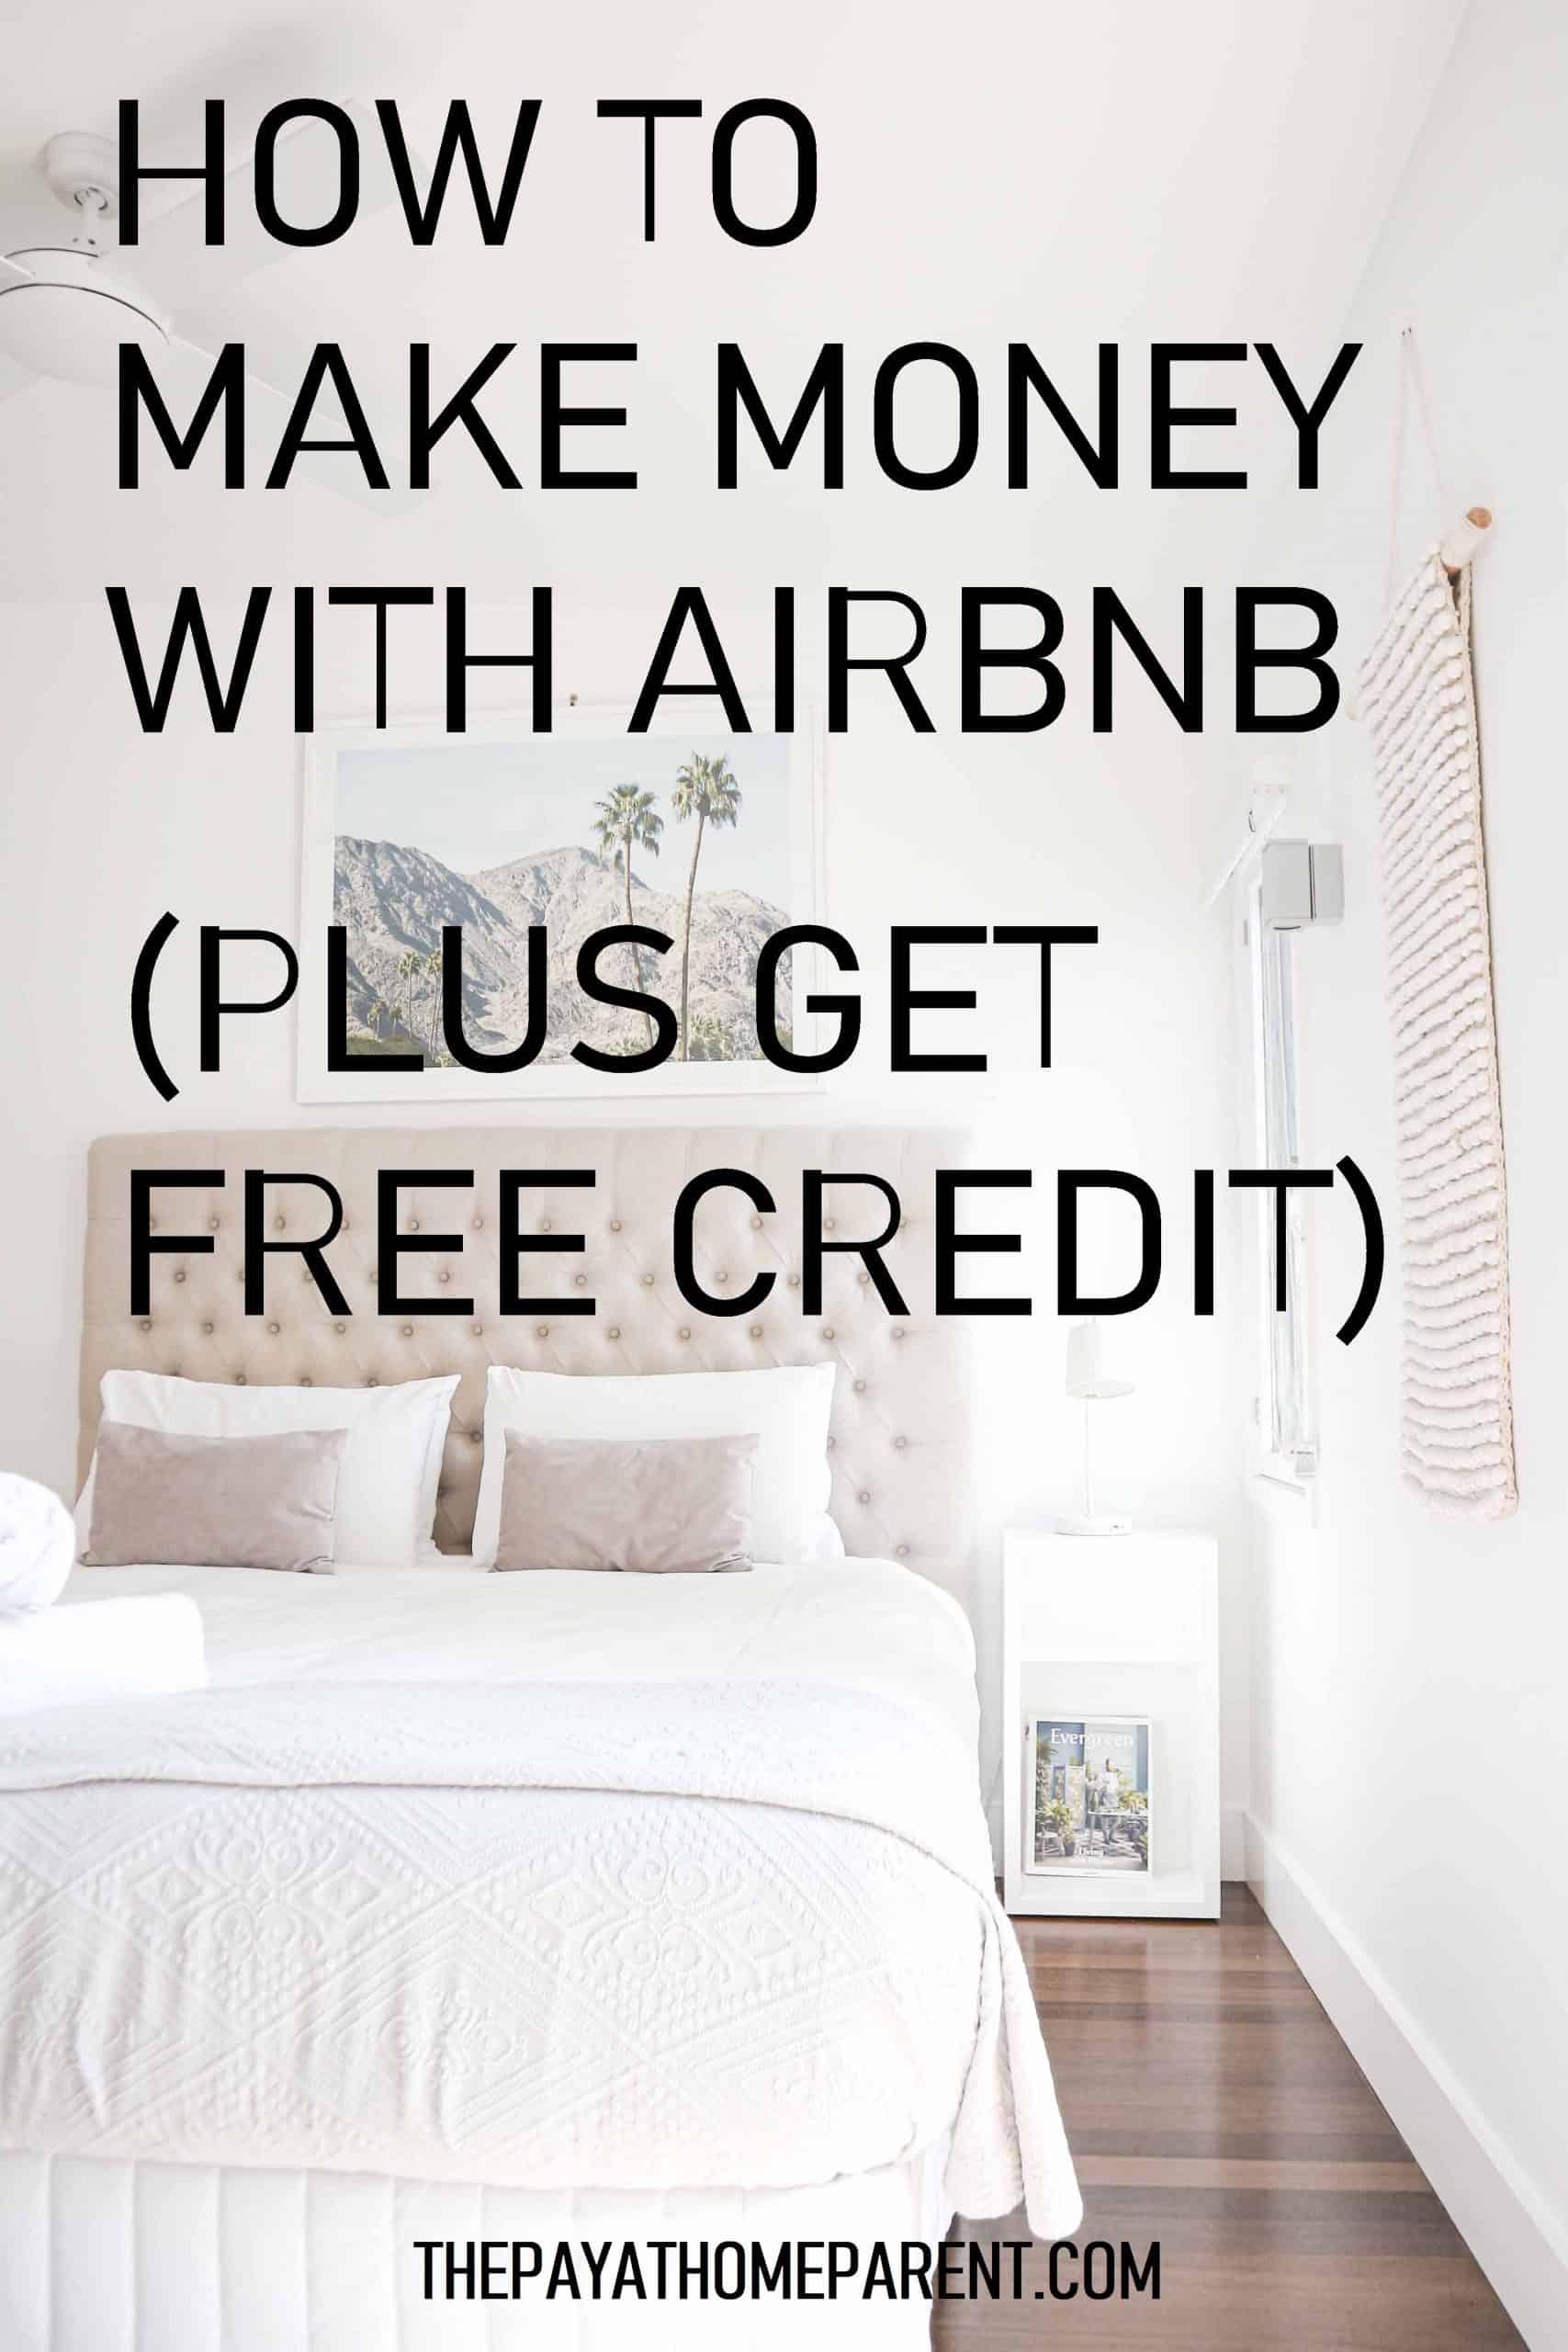 Free airbnb credit